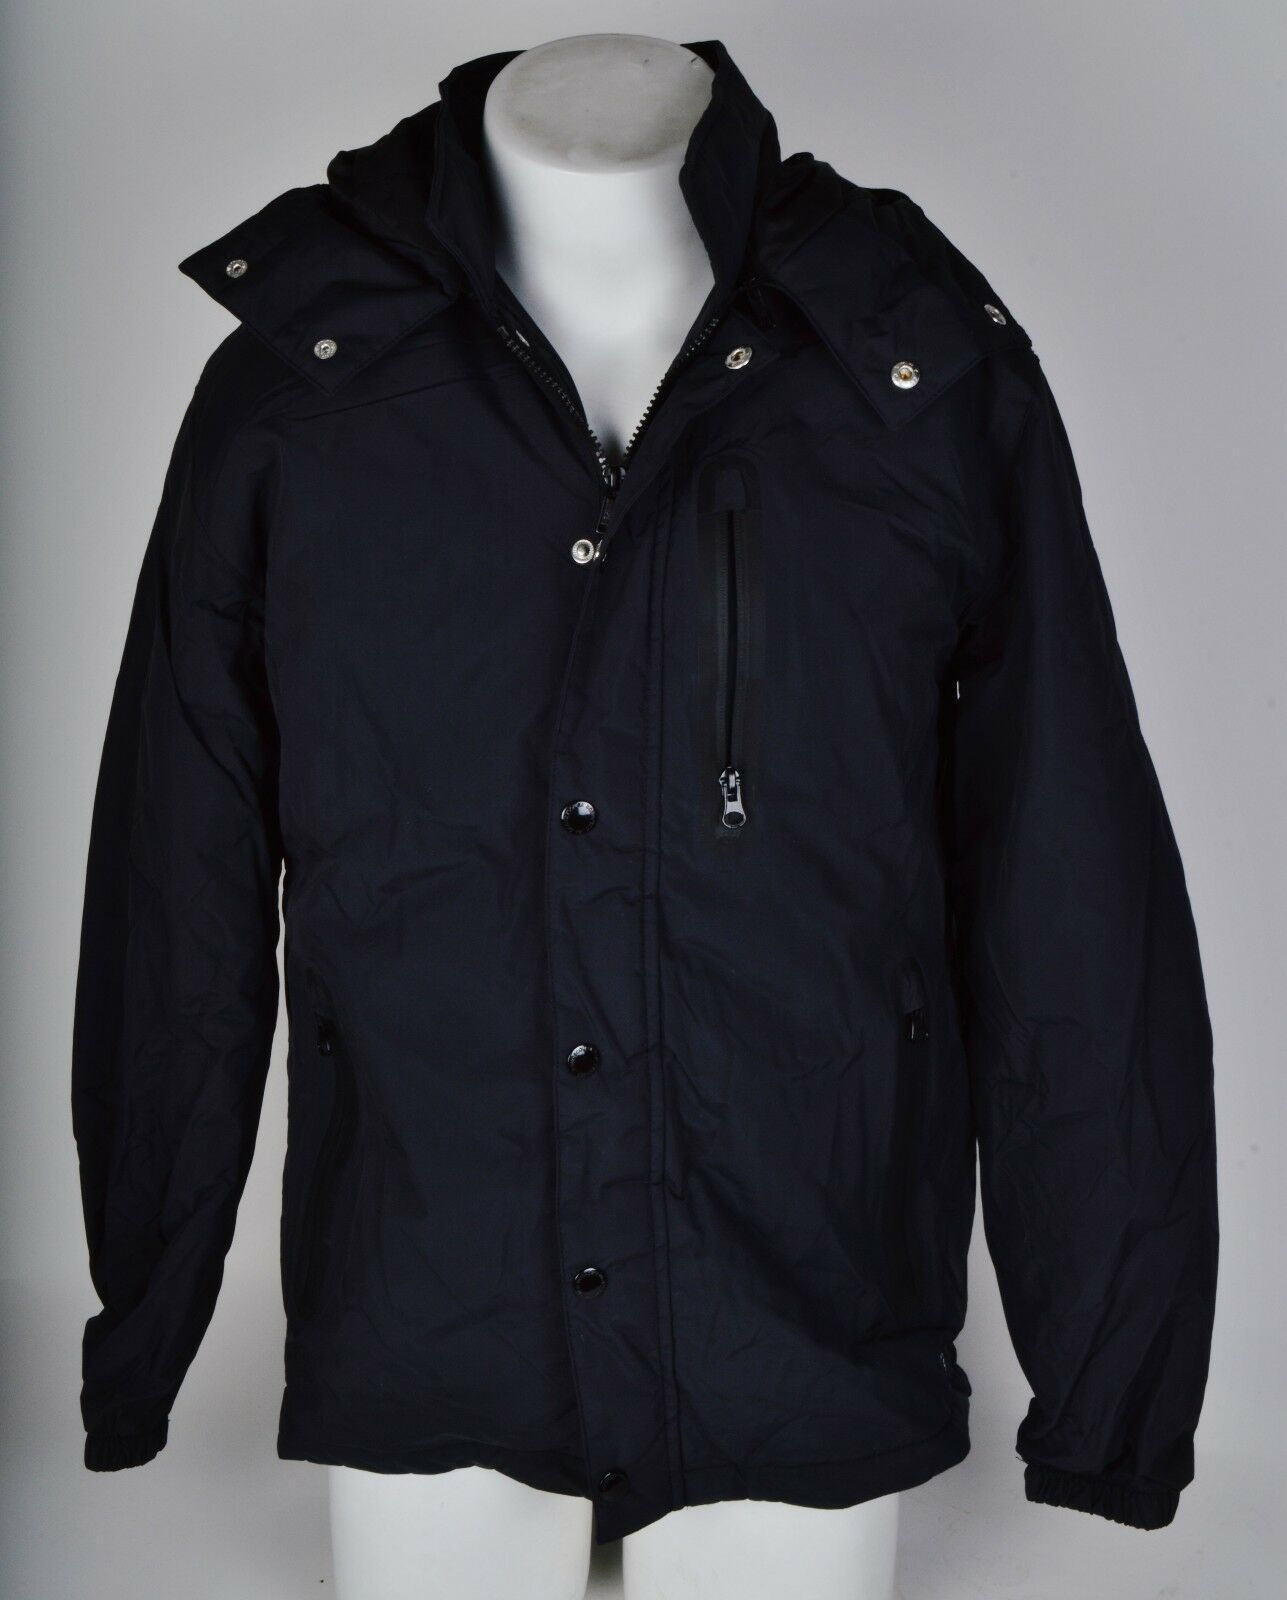 2016 NWOT MENS DC LIGHT WINTER JACKET  80 M schwarz full zip removable hood